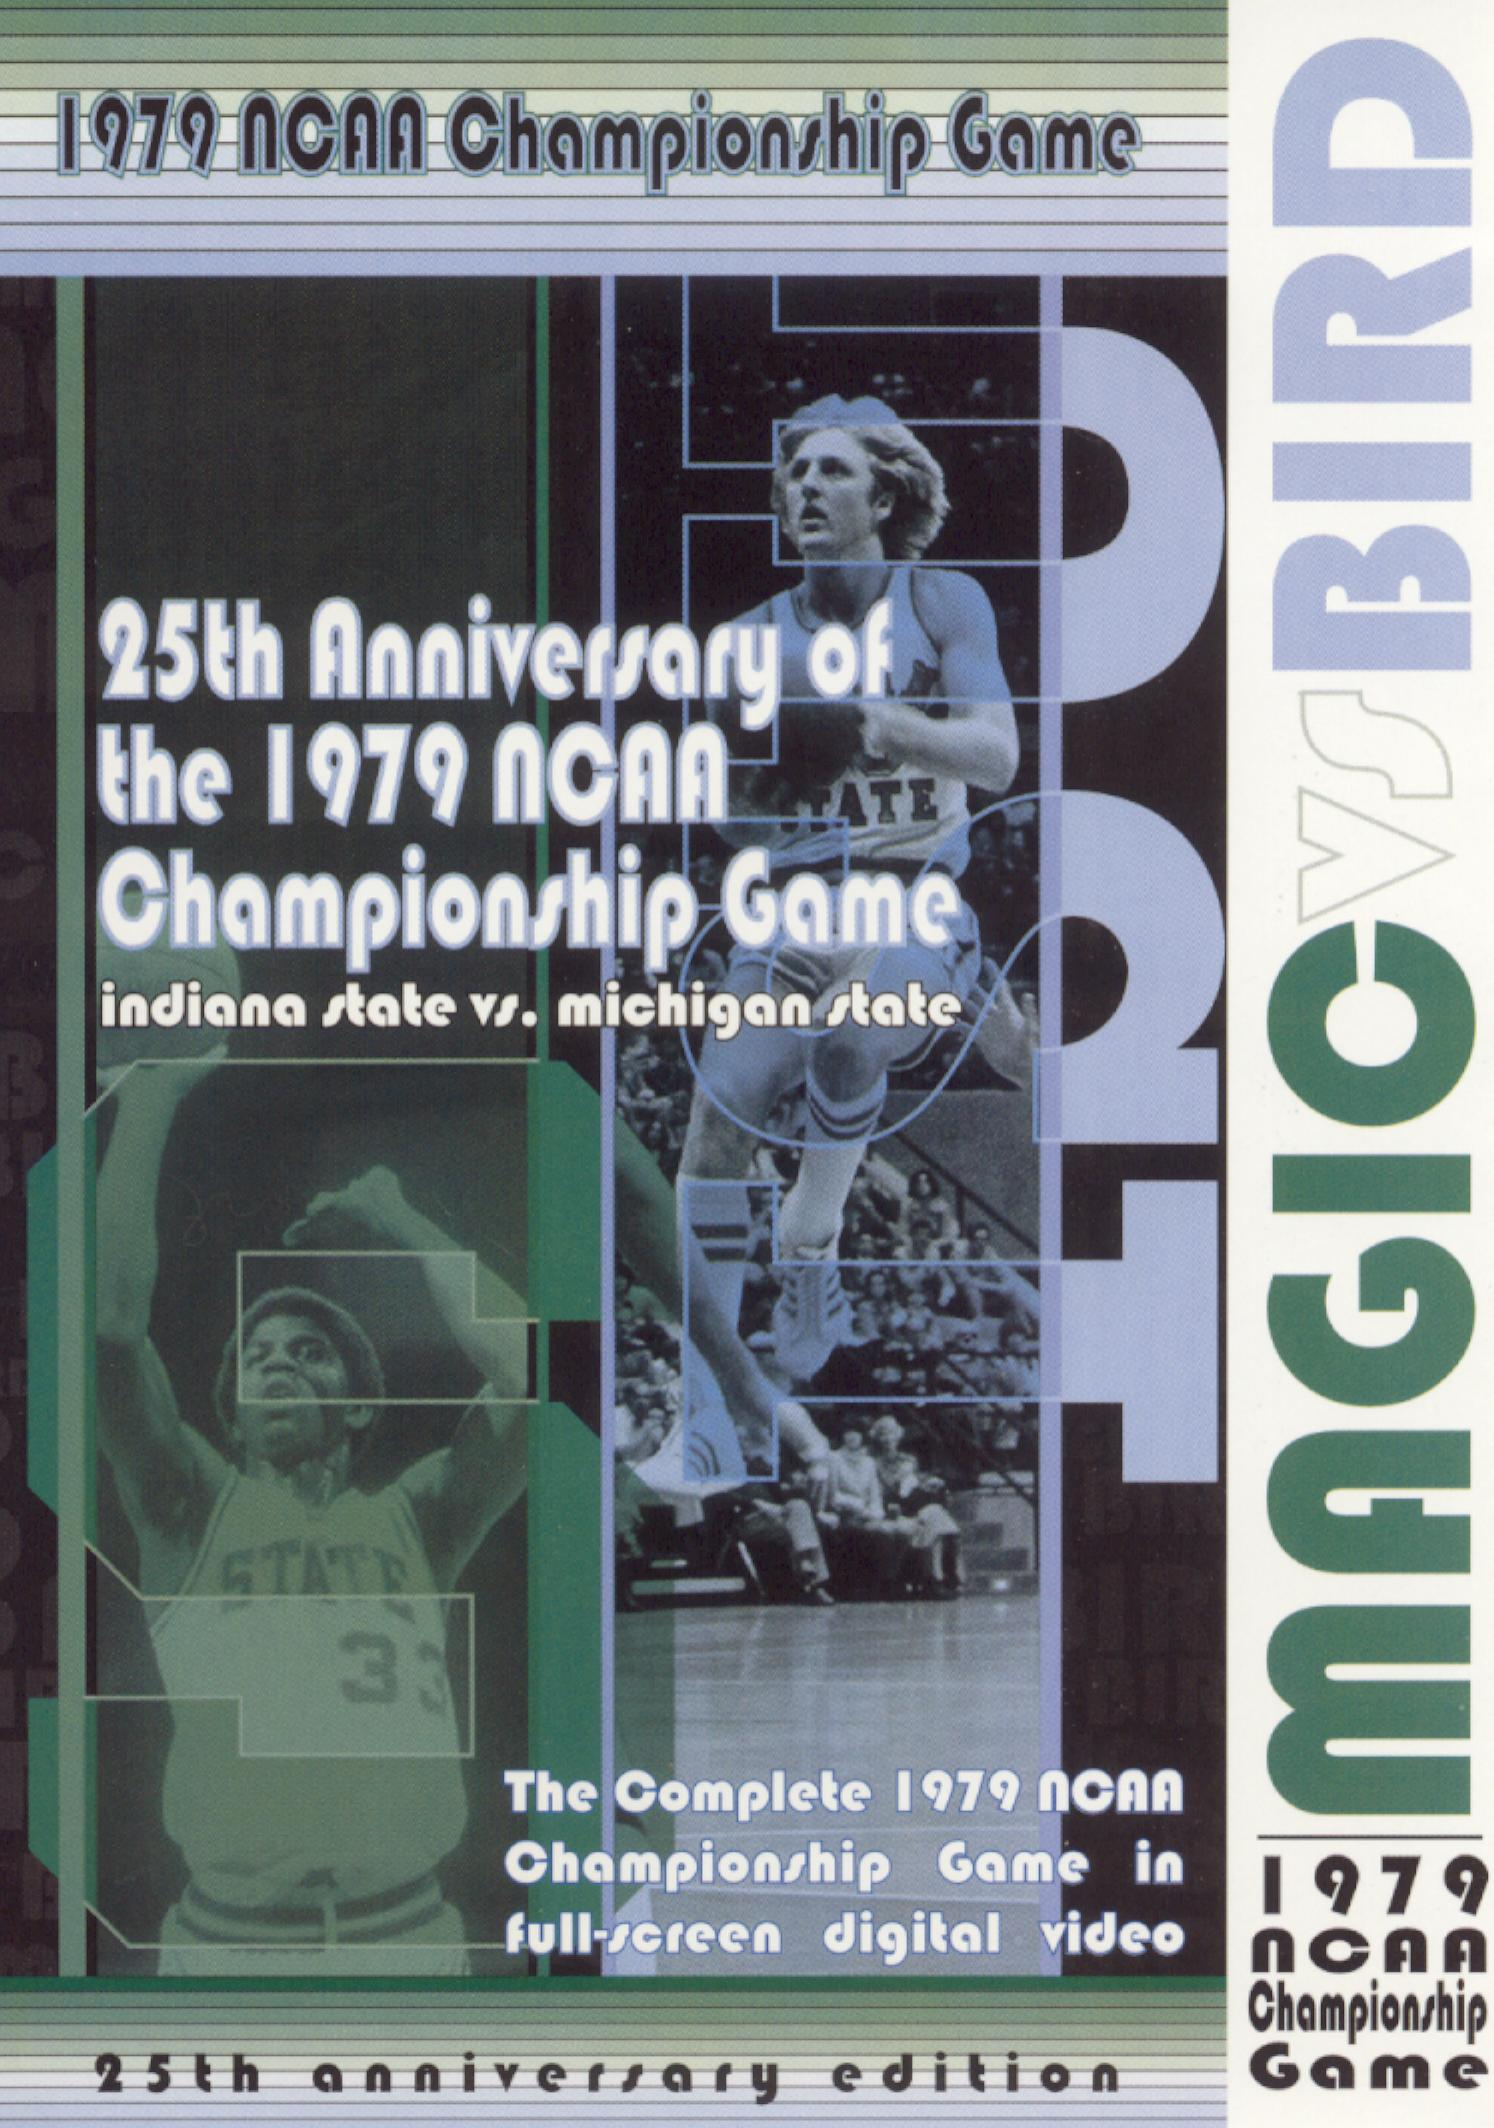 Magic vs. Bird: 25th Anniversary of the 1979 NCAA Chmpionship Game